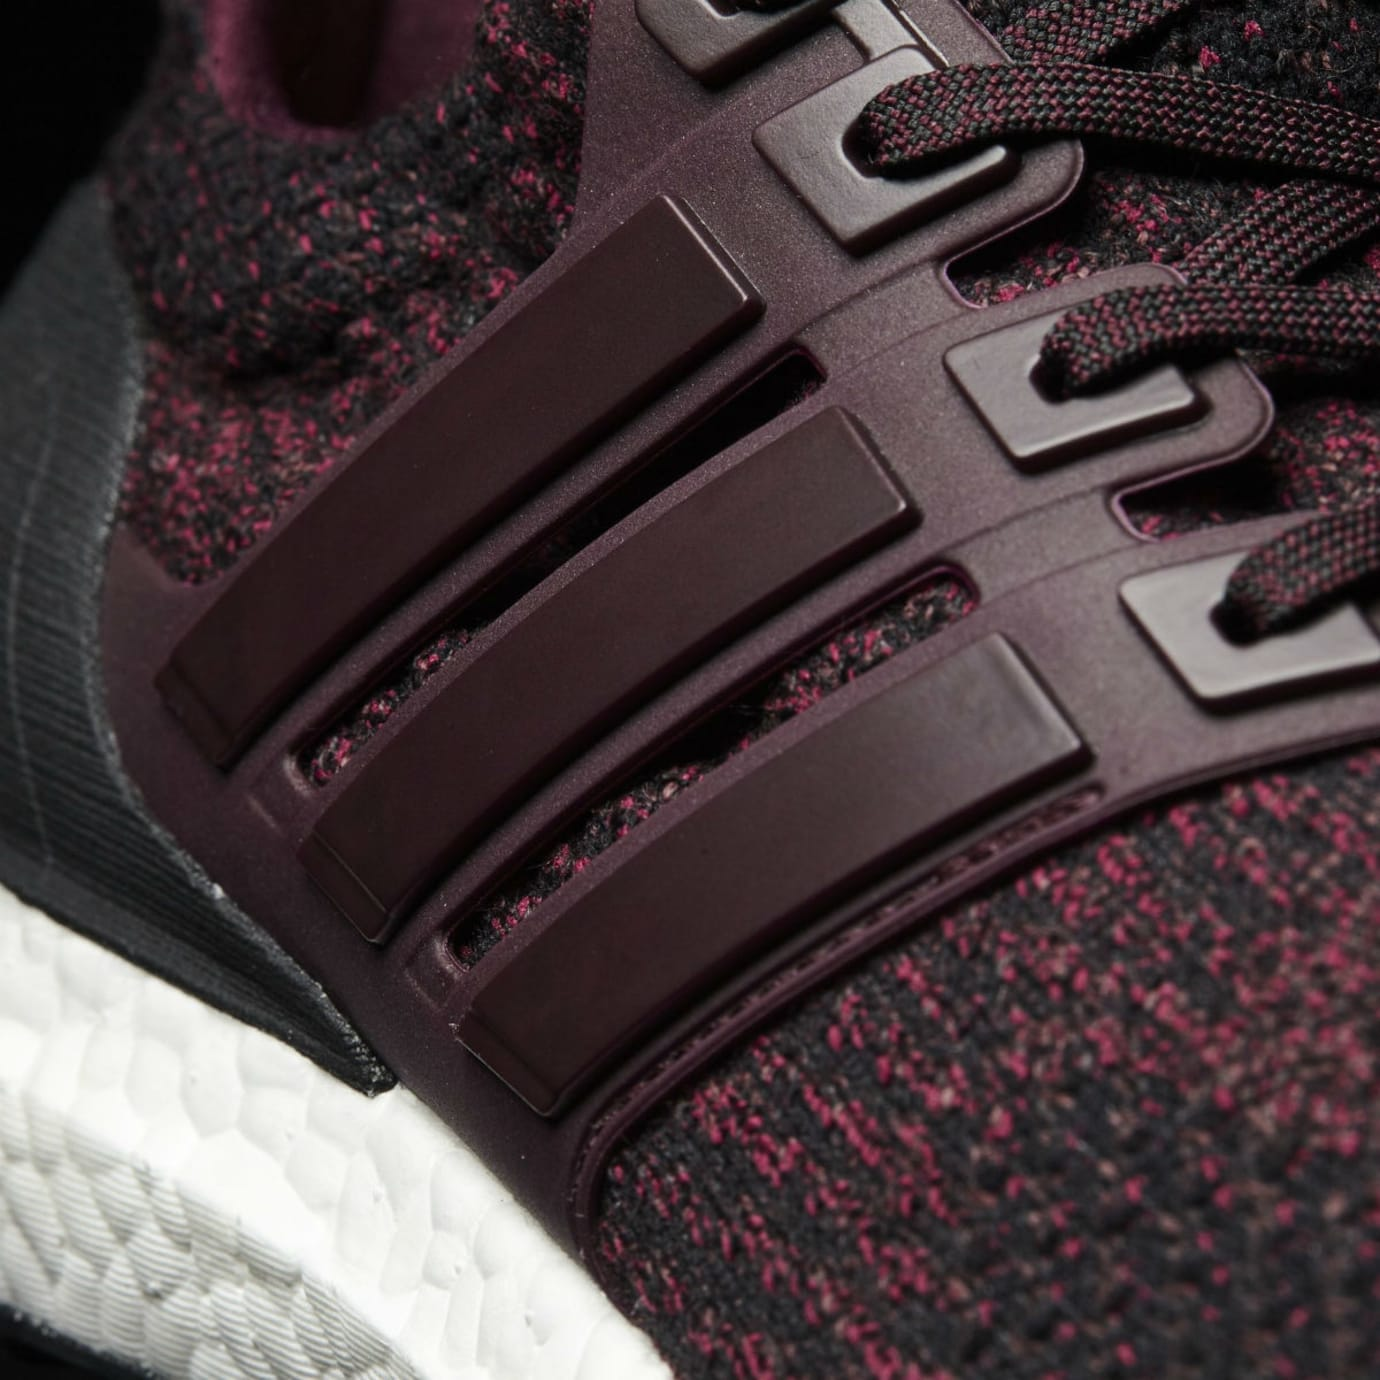 Adidas Ultra Boost 3.0 Dark Burgundy Release Date Cage S80732